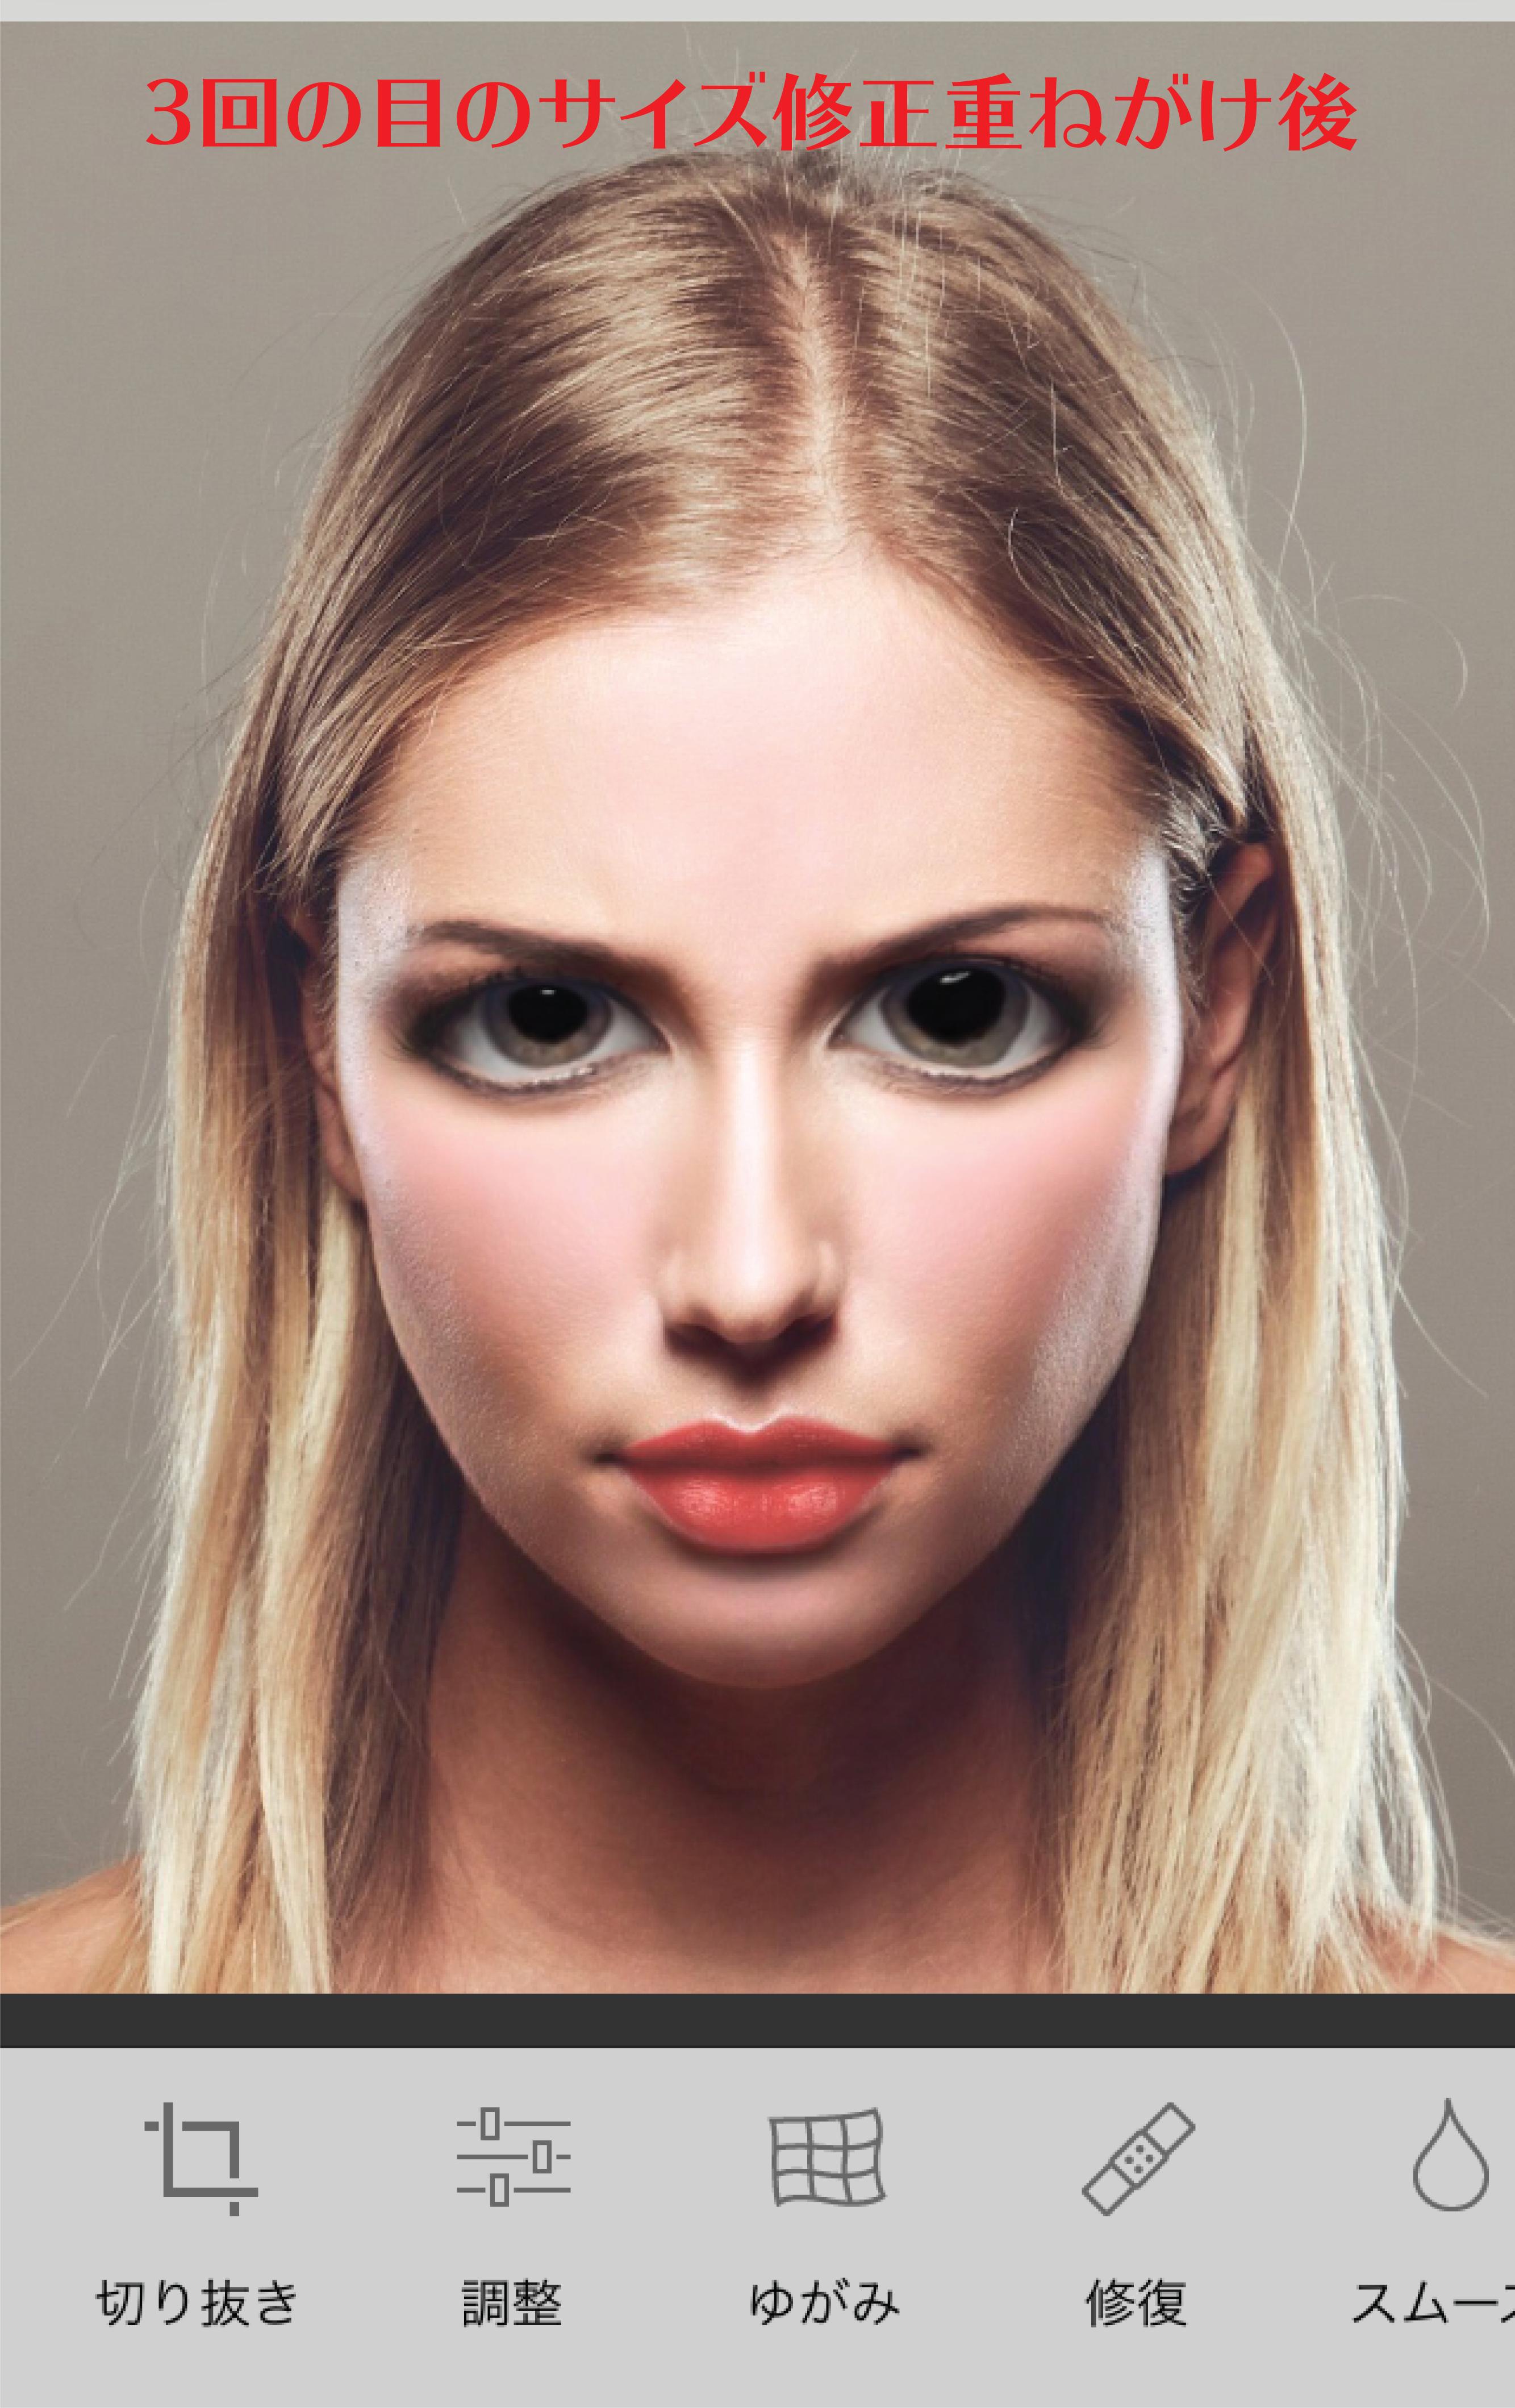 PhotoshopFix 07